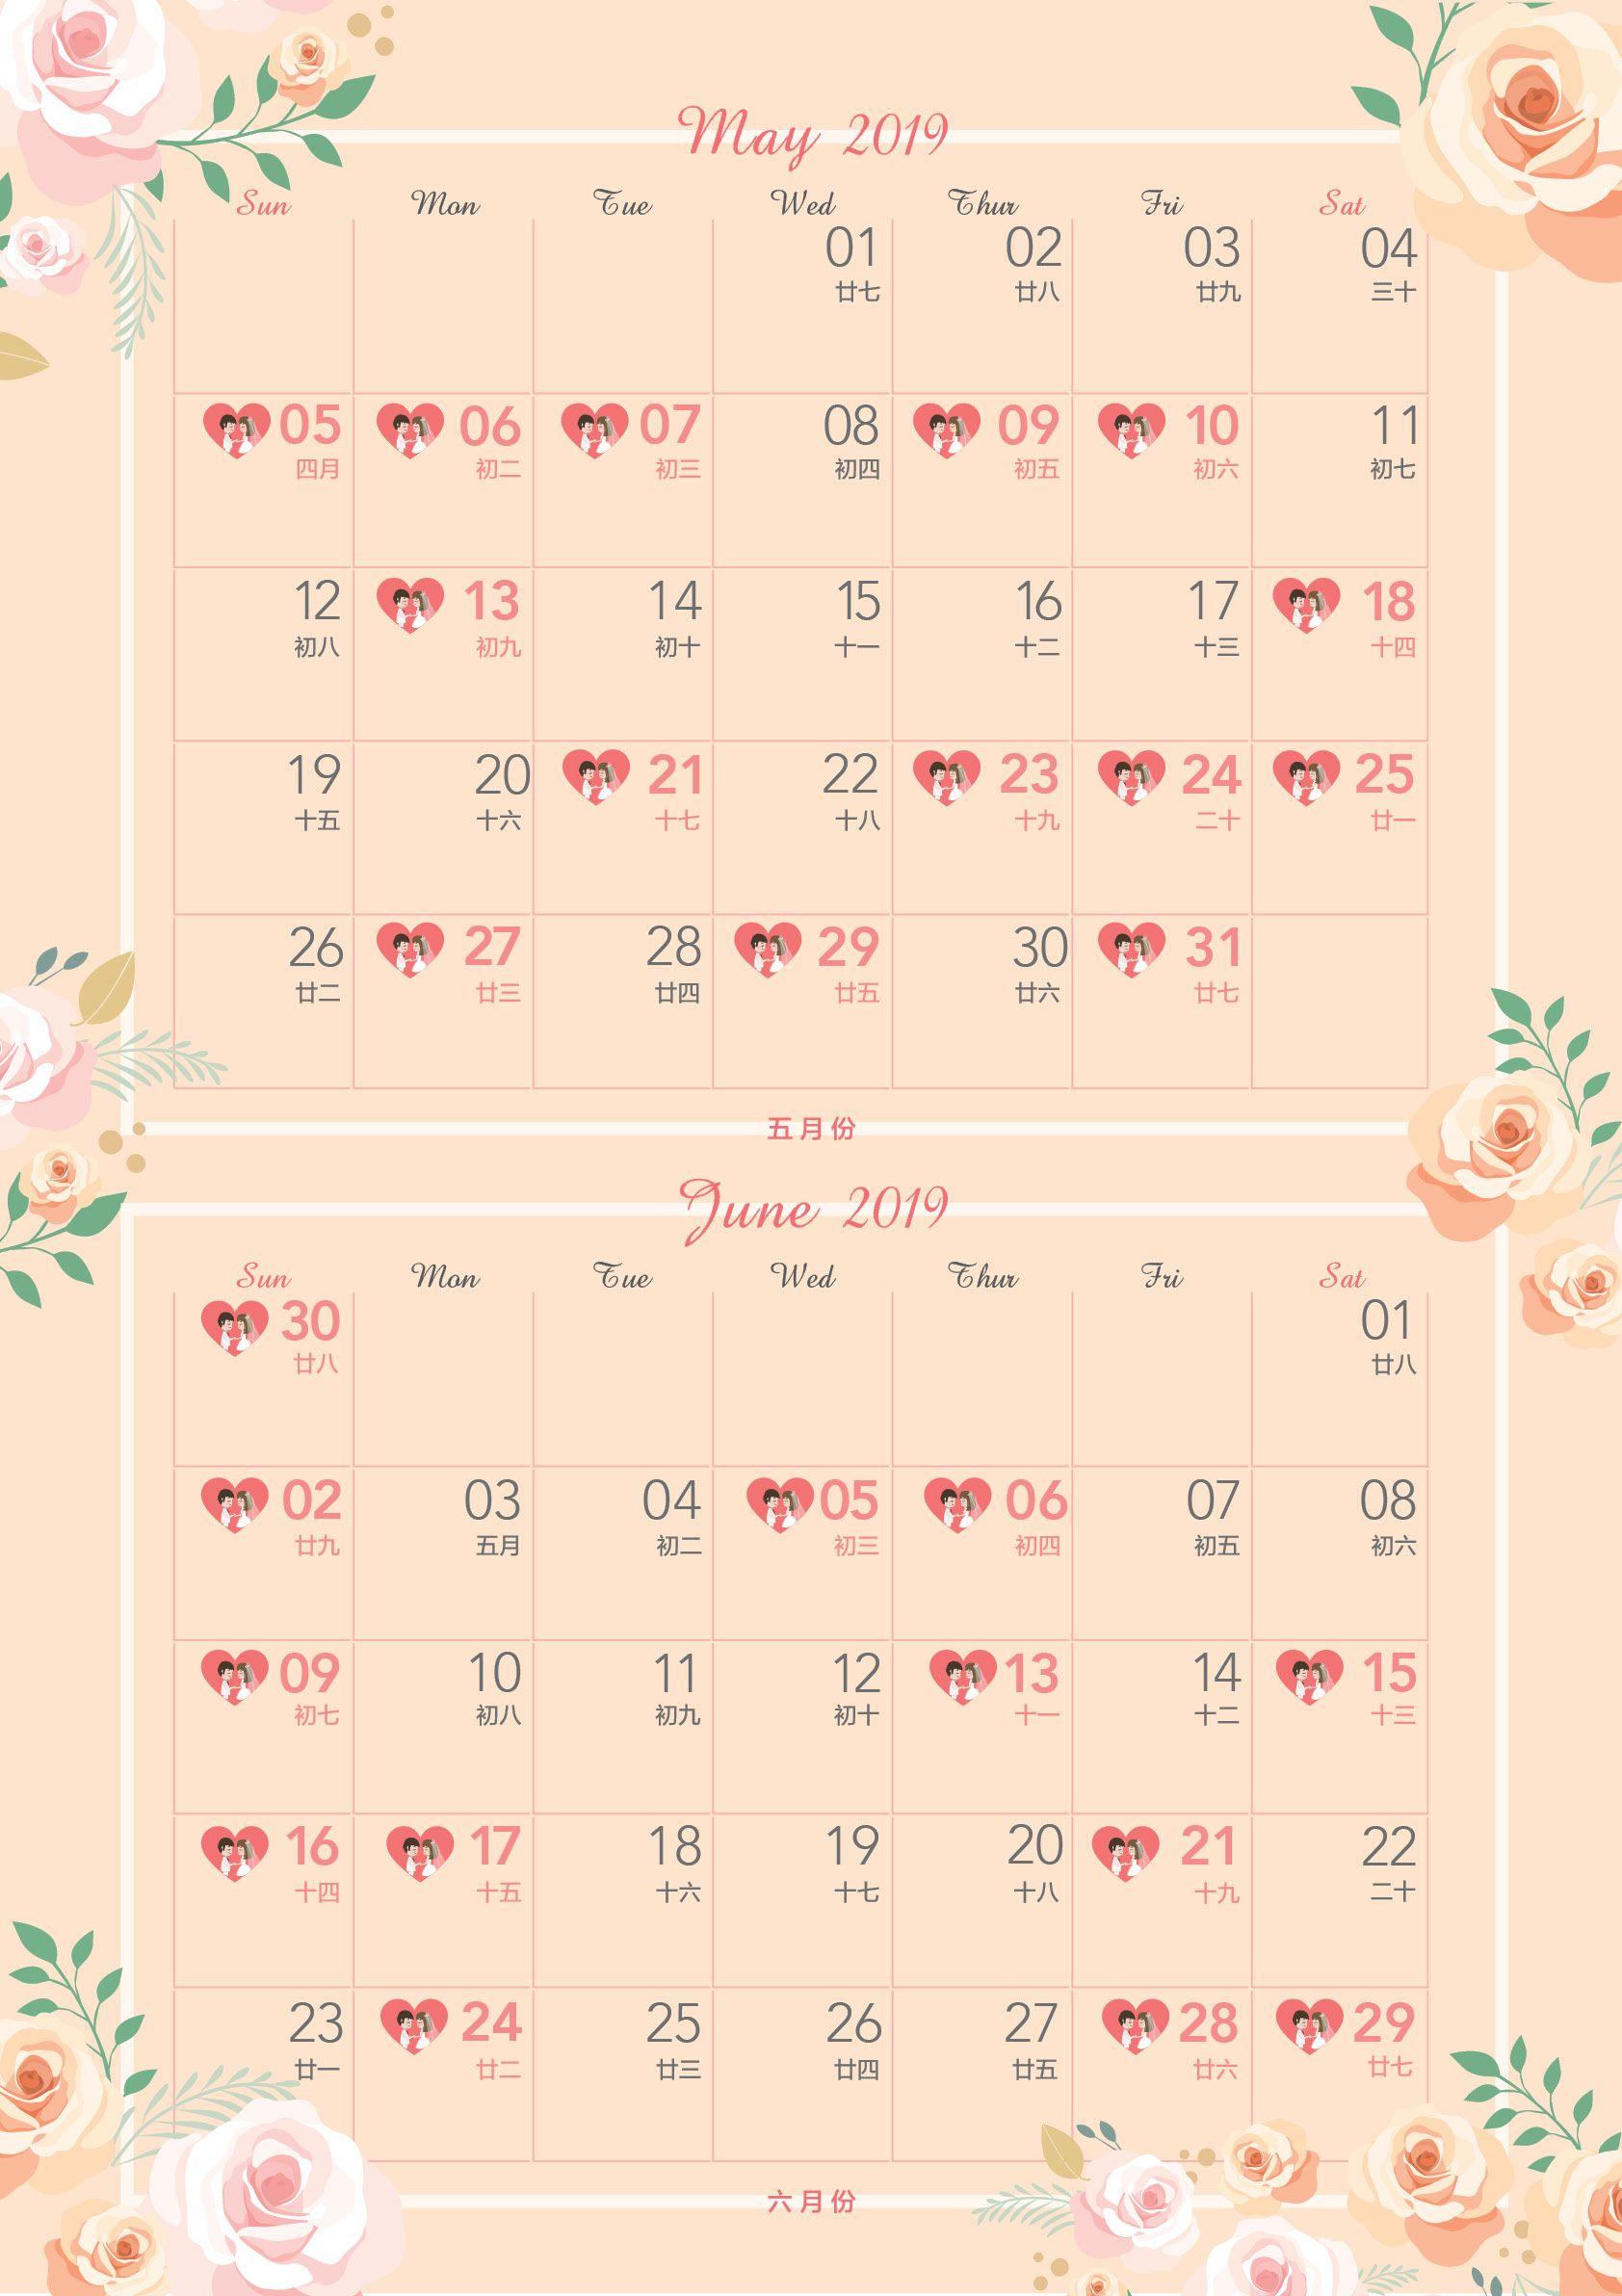 May 2019 June 2019 Wedding Dates Wedding Calendar Wedding